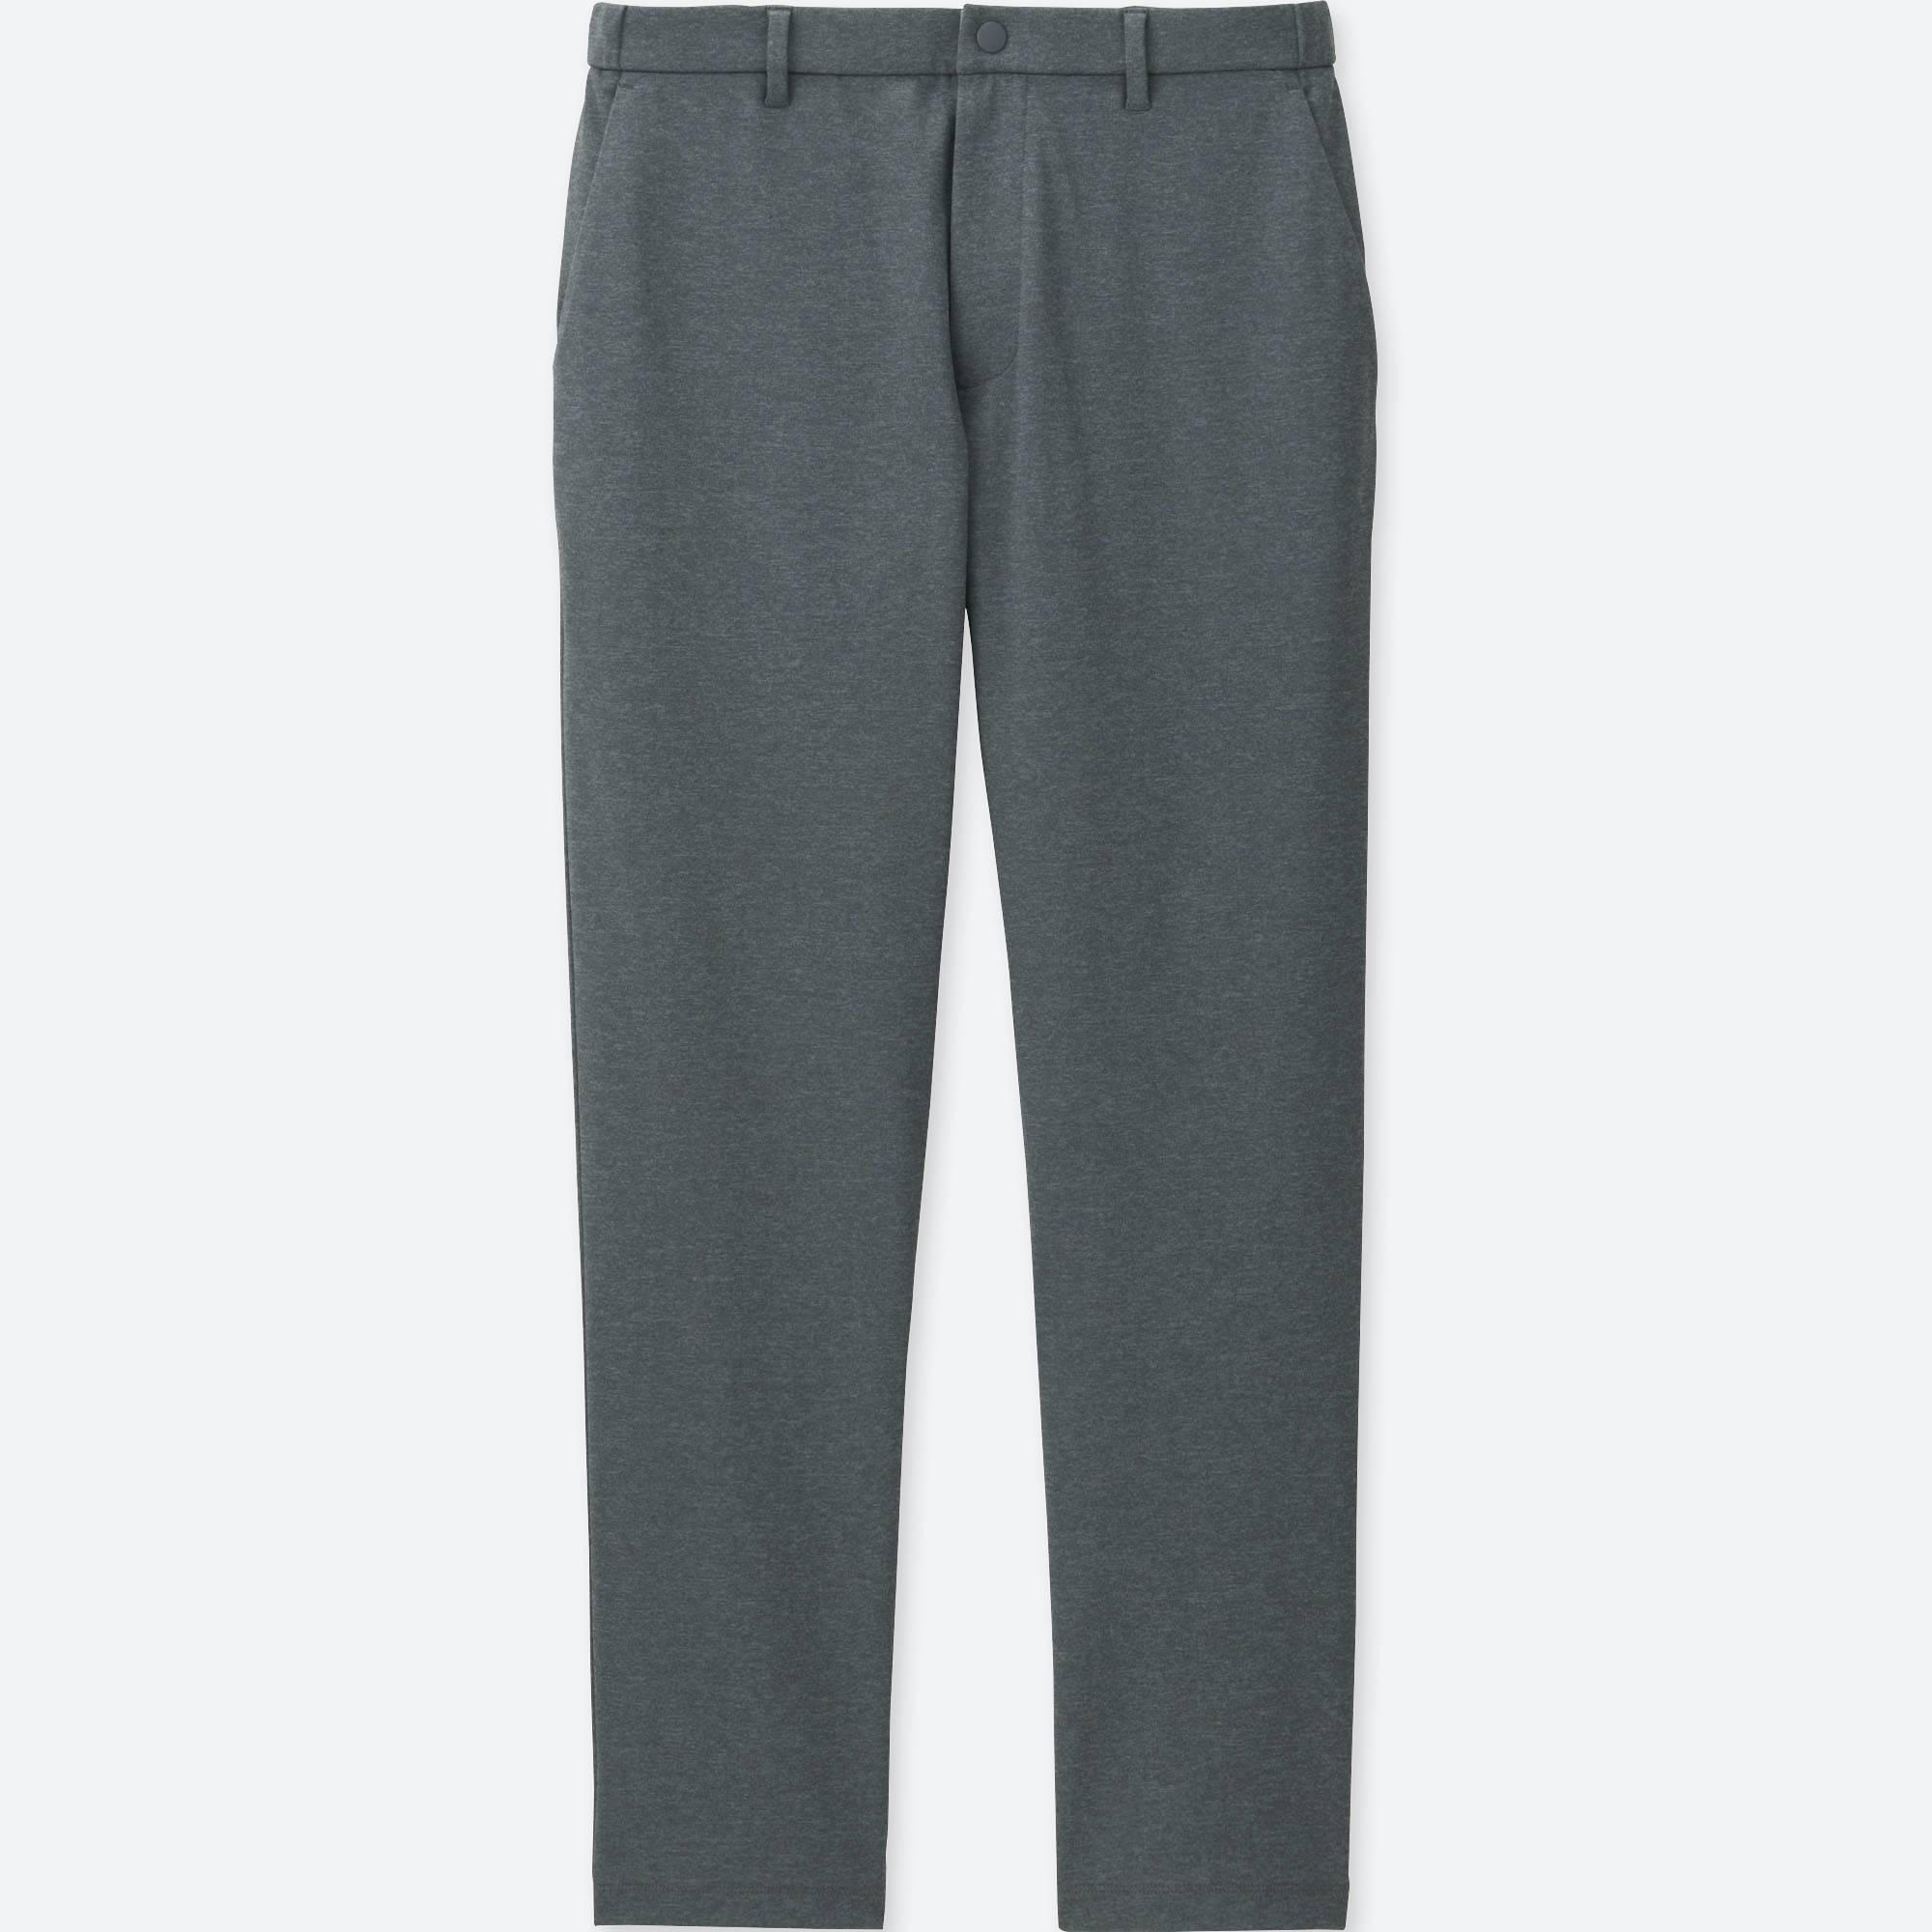 Men Ultra Stretch Dry Ex Pants